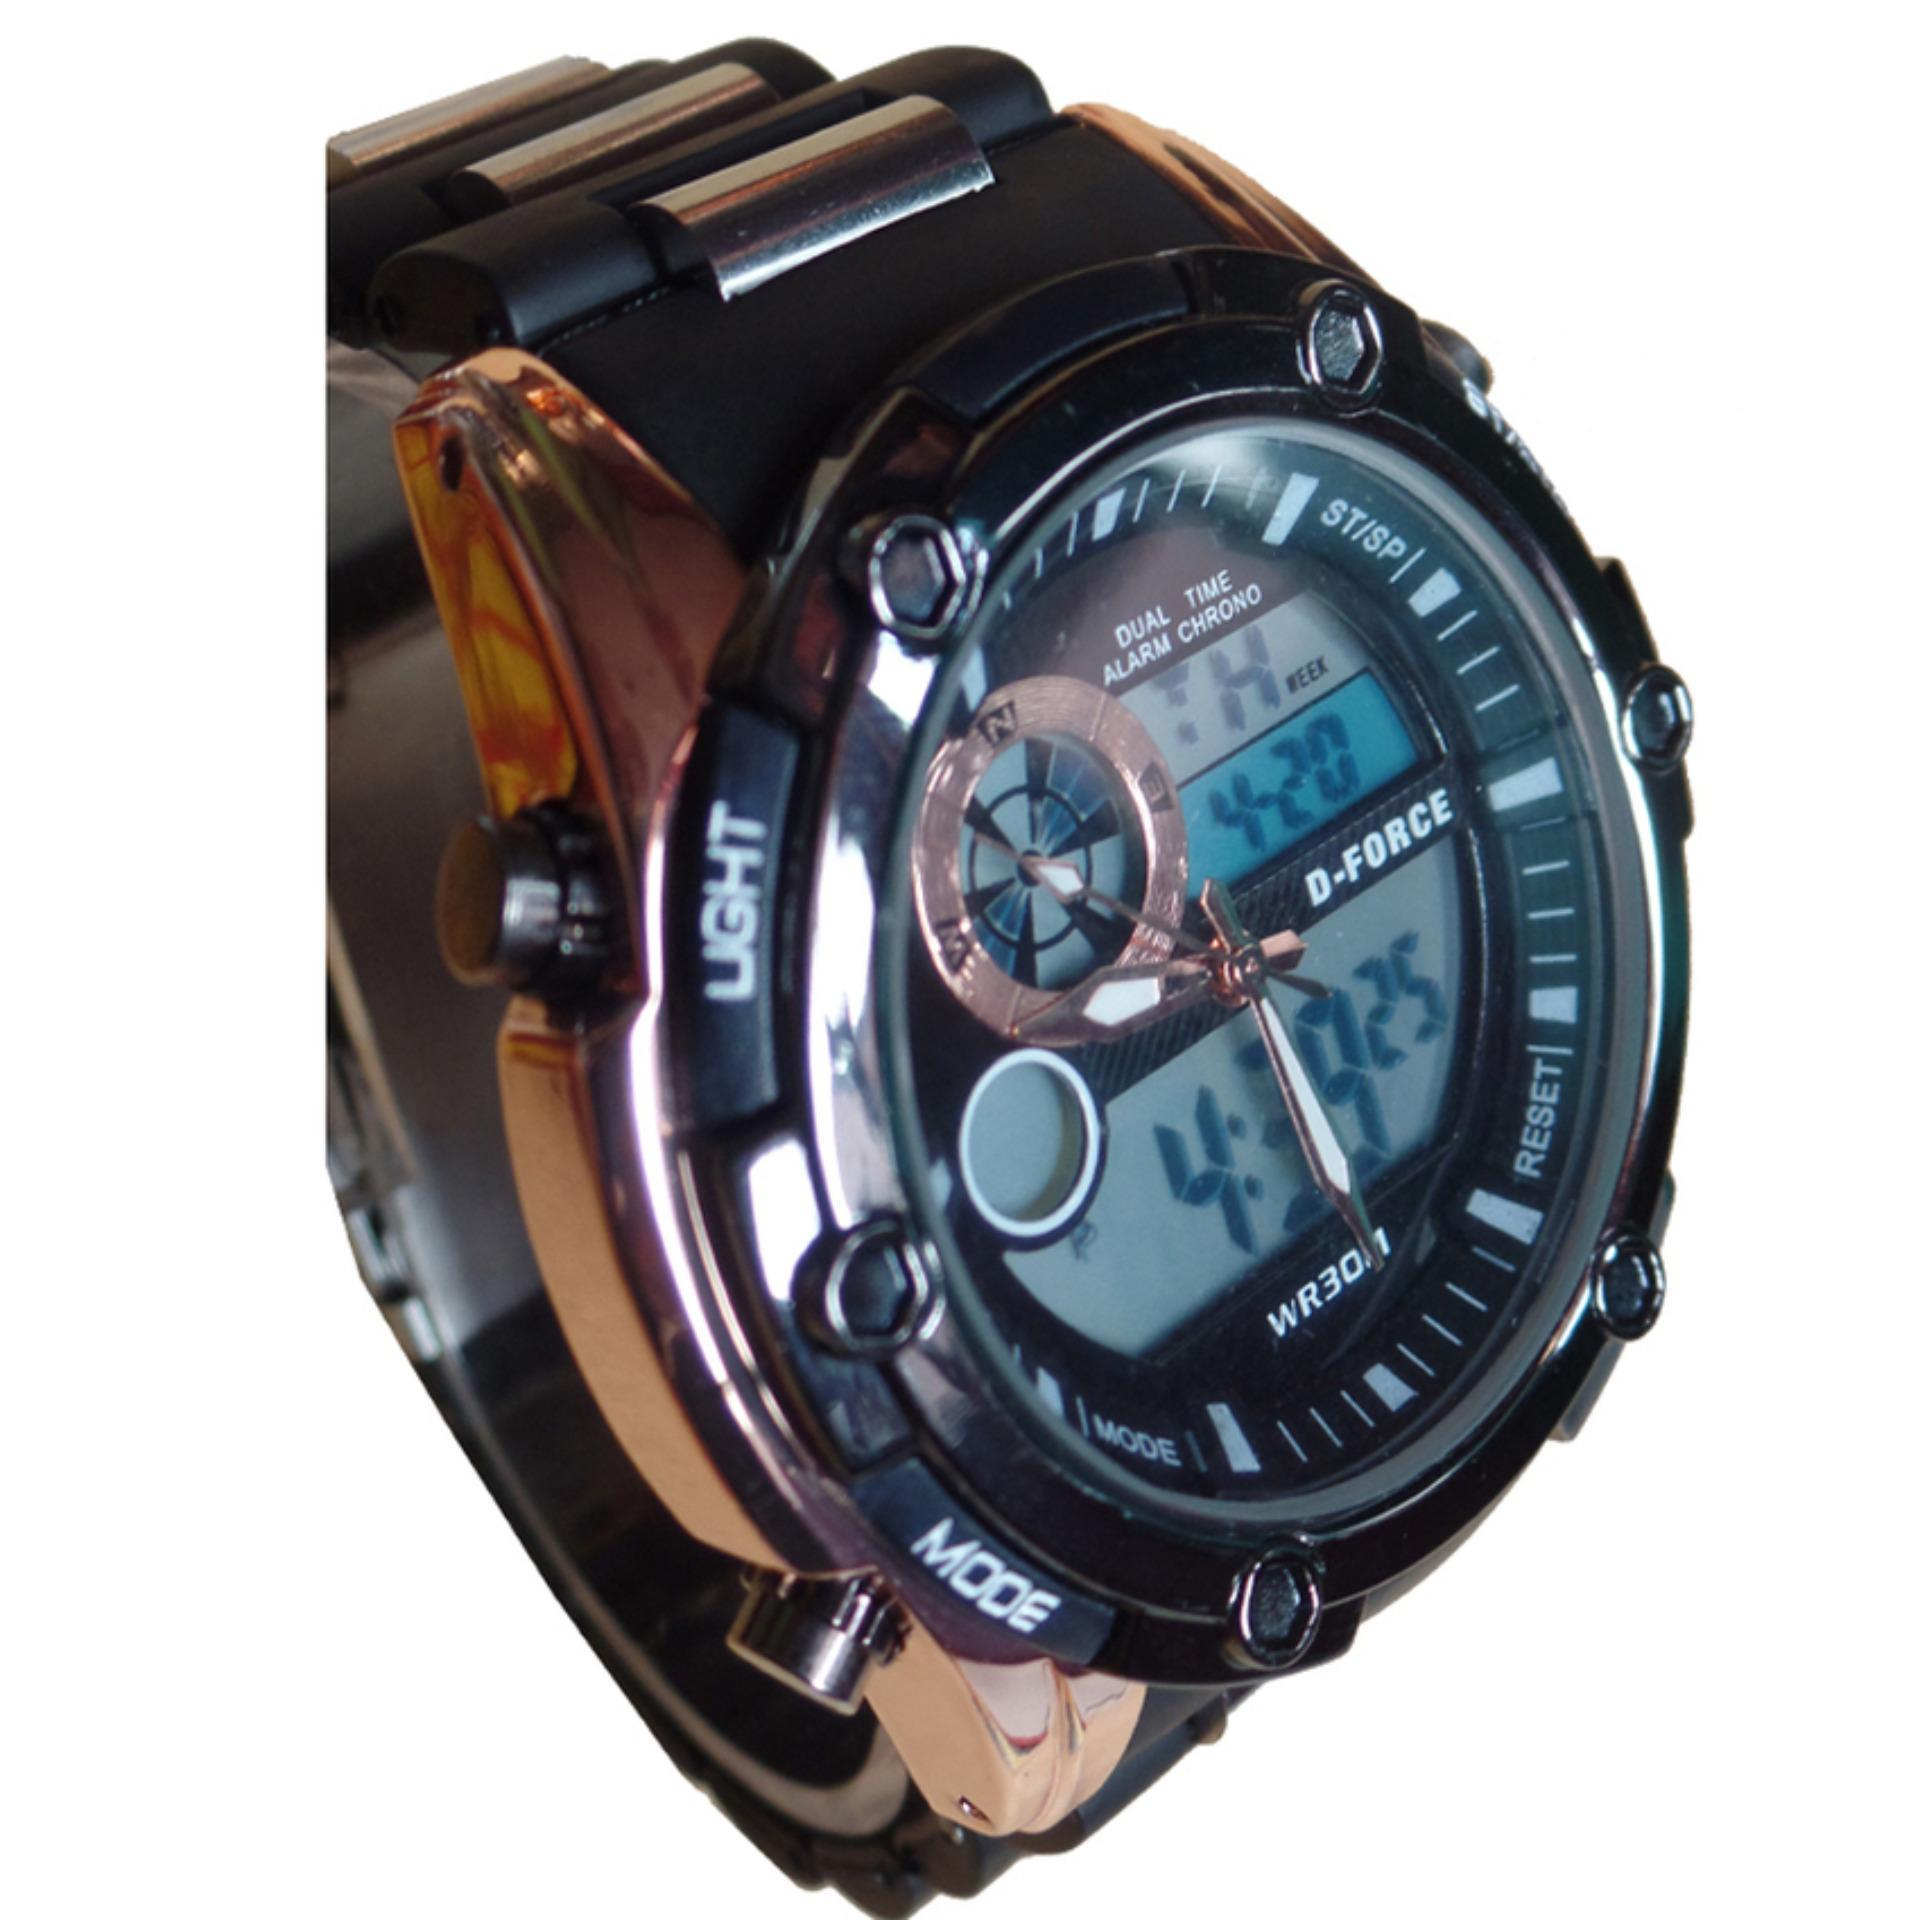 Jam Tangan Alexandre Christie Terbaru Promo Produk Terlaris Rhythm Global Timepiece Rq1611s 07 Pria Silver Putih D Force Strap Binasi Stainless Steel Hitam Df108ks